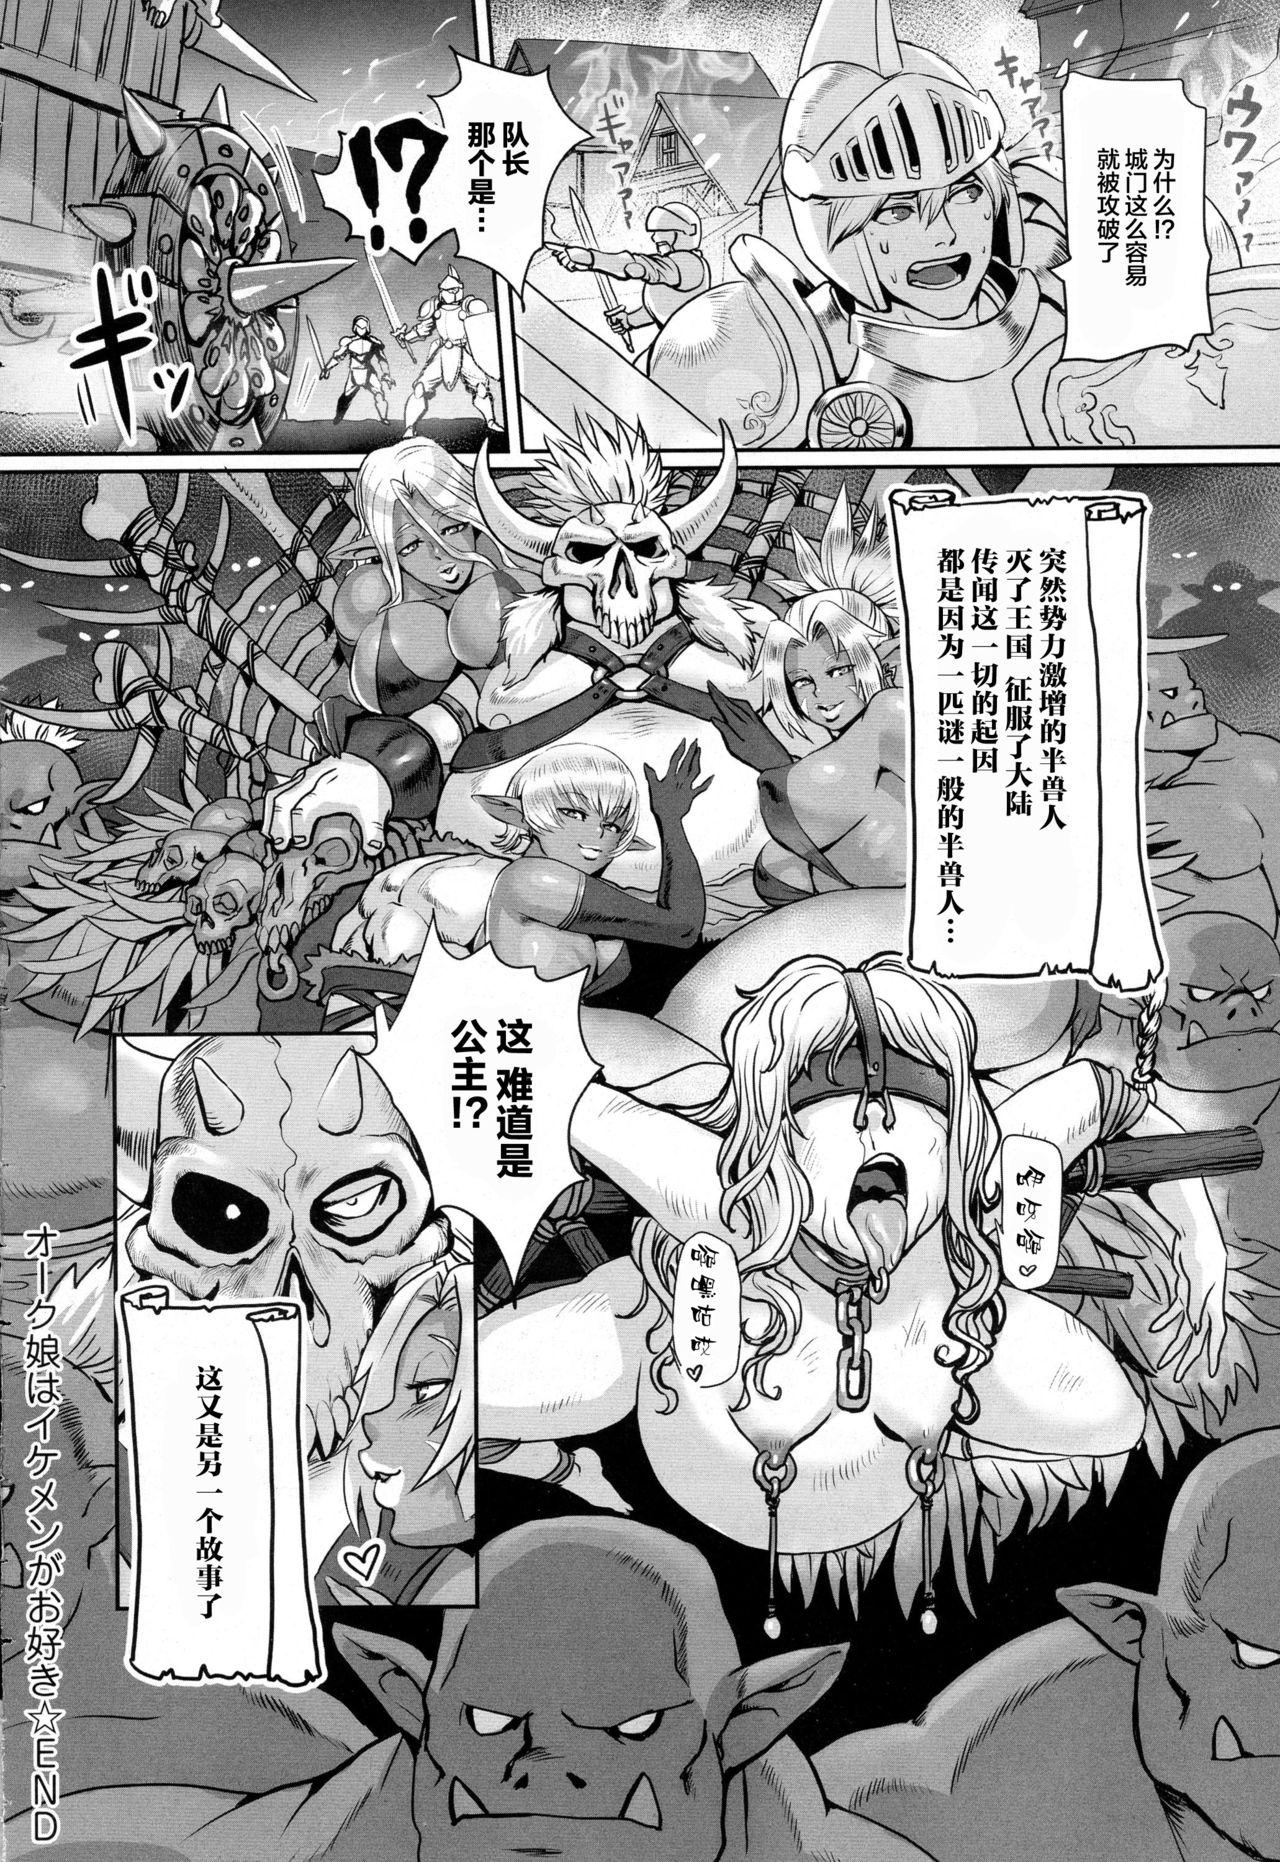 Orc Musume wa Ikemen ga Osuki | 雌性半兽人喜欢帅哥 27